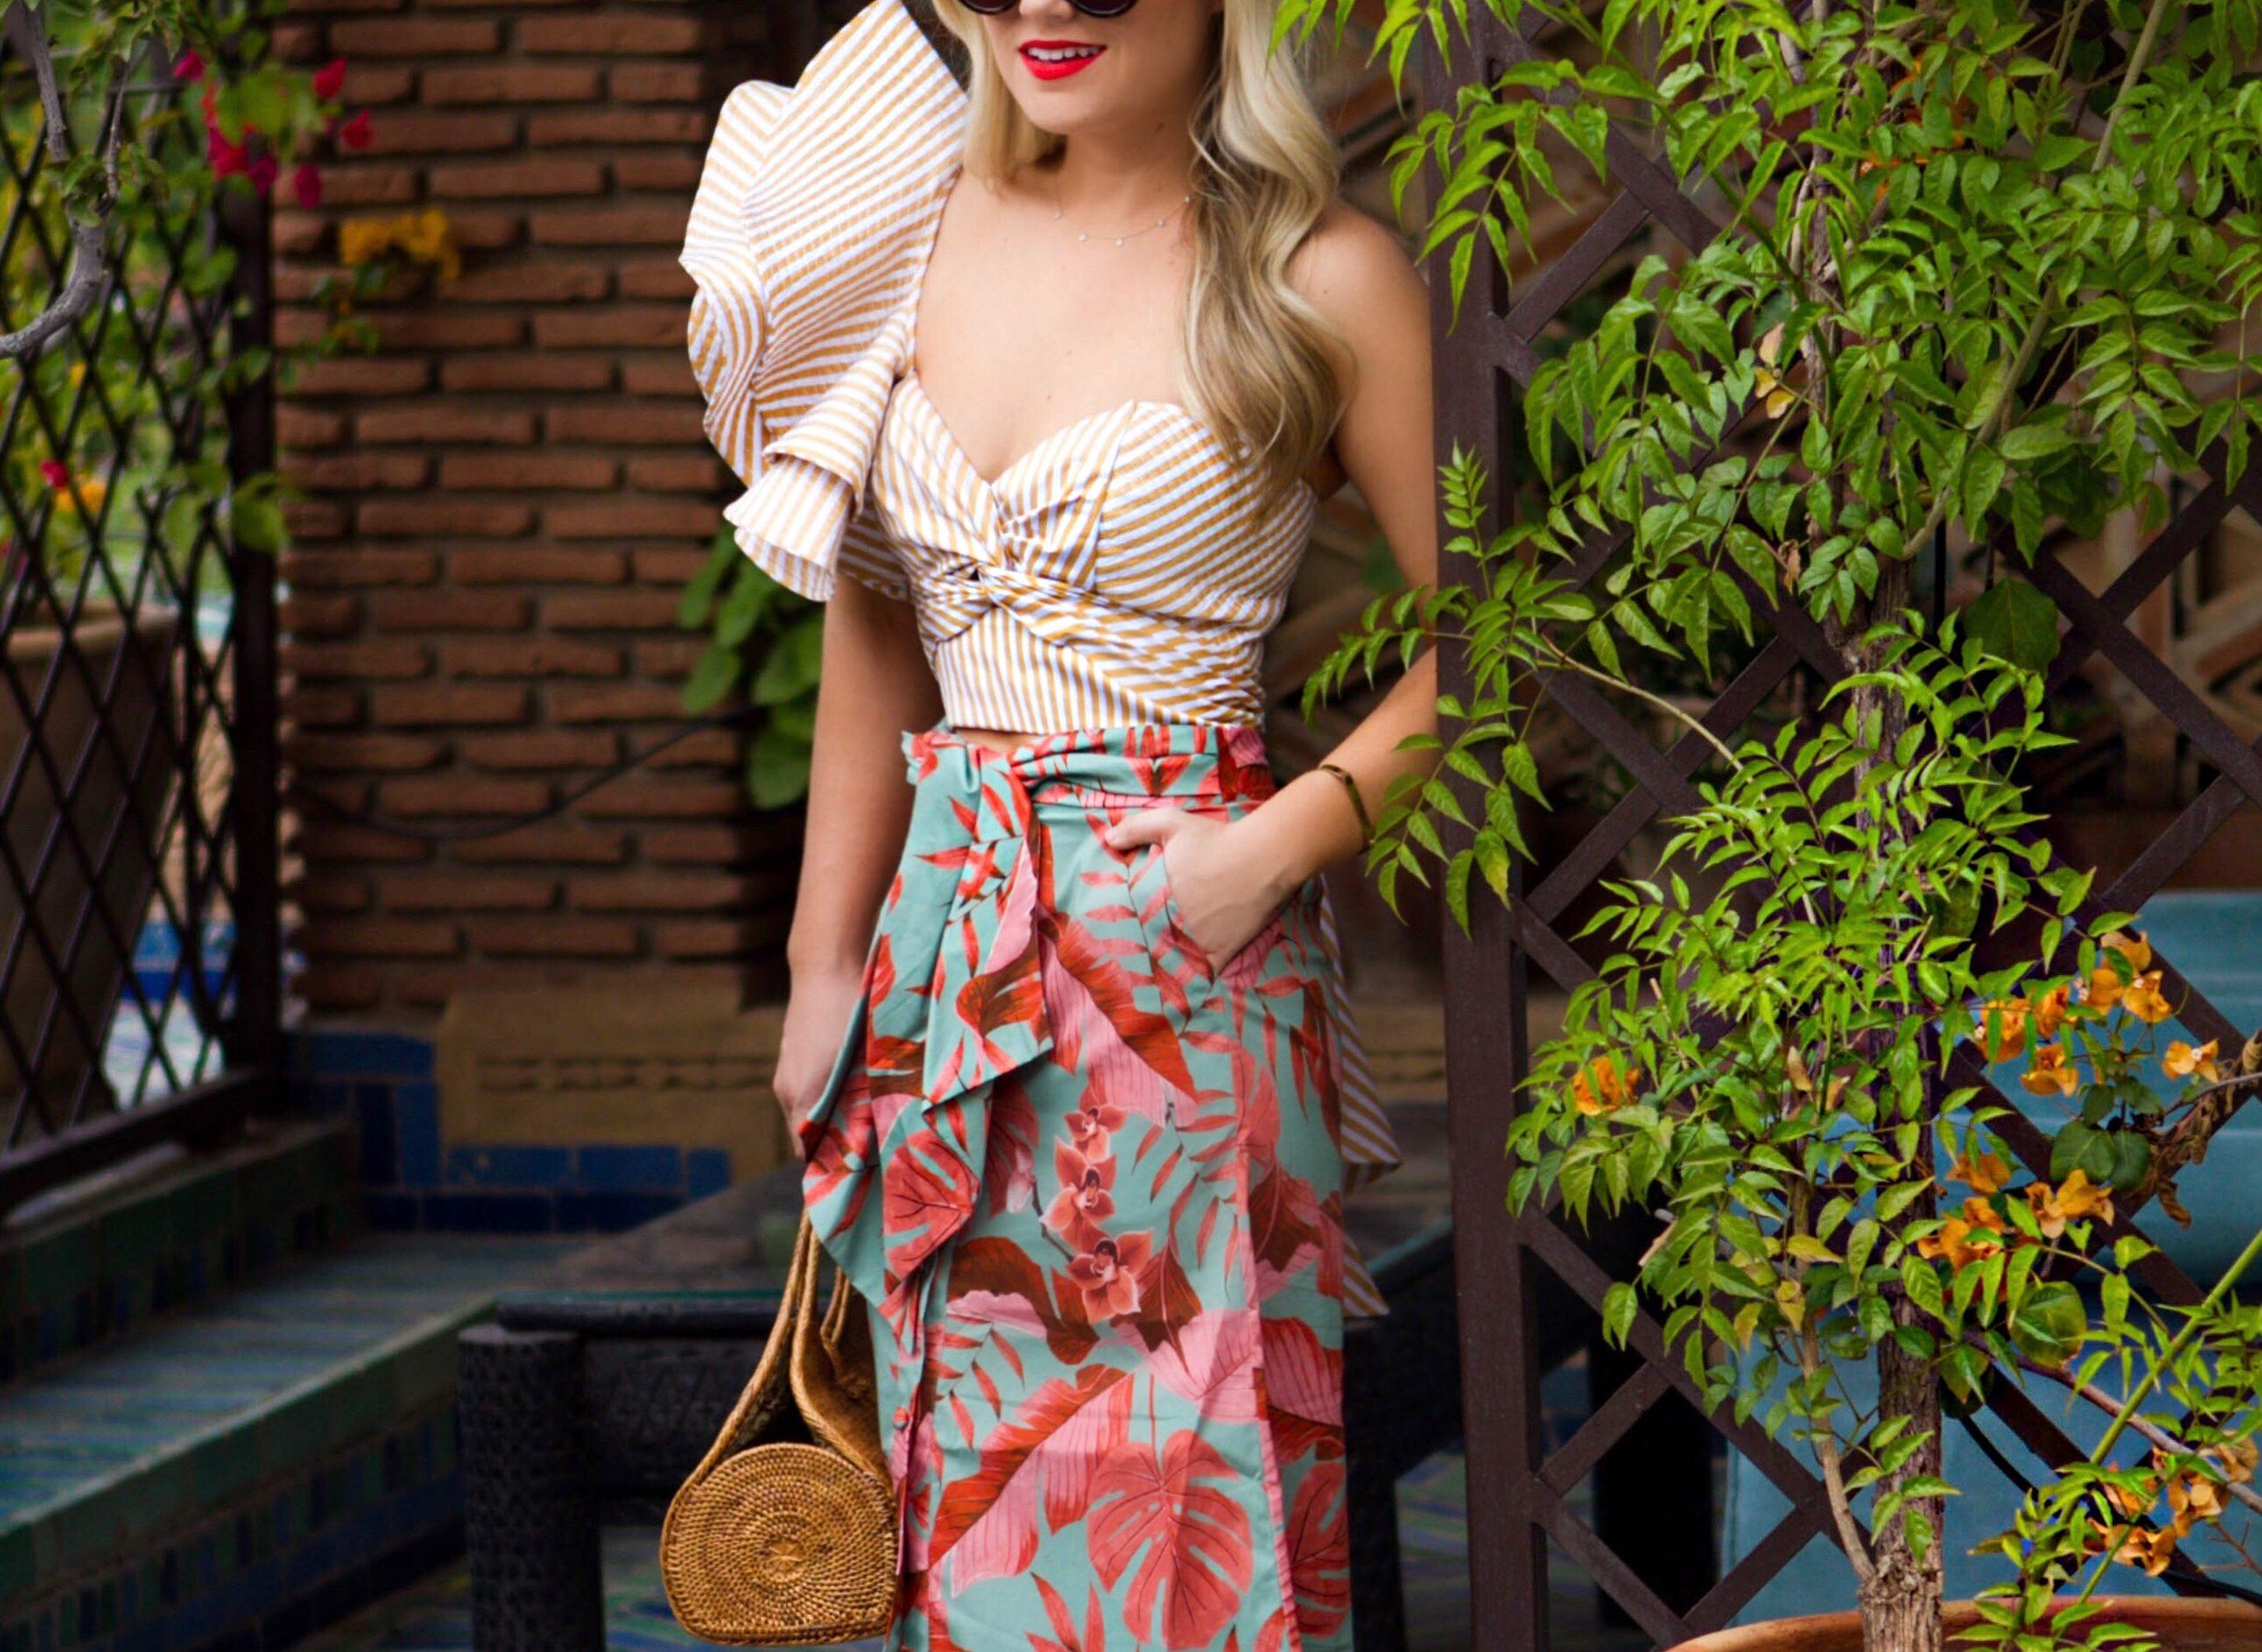 Lo-Murphy-Johanna-Ortiz-Ruffle-Top-printed-midi-skirt-schutz-shoes-marrakech-vacation-style-ruffles